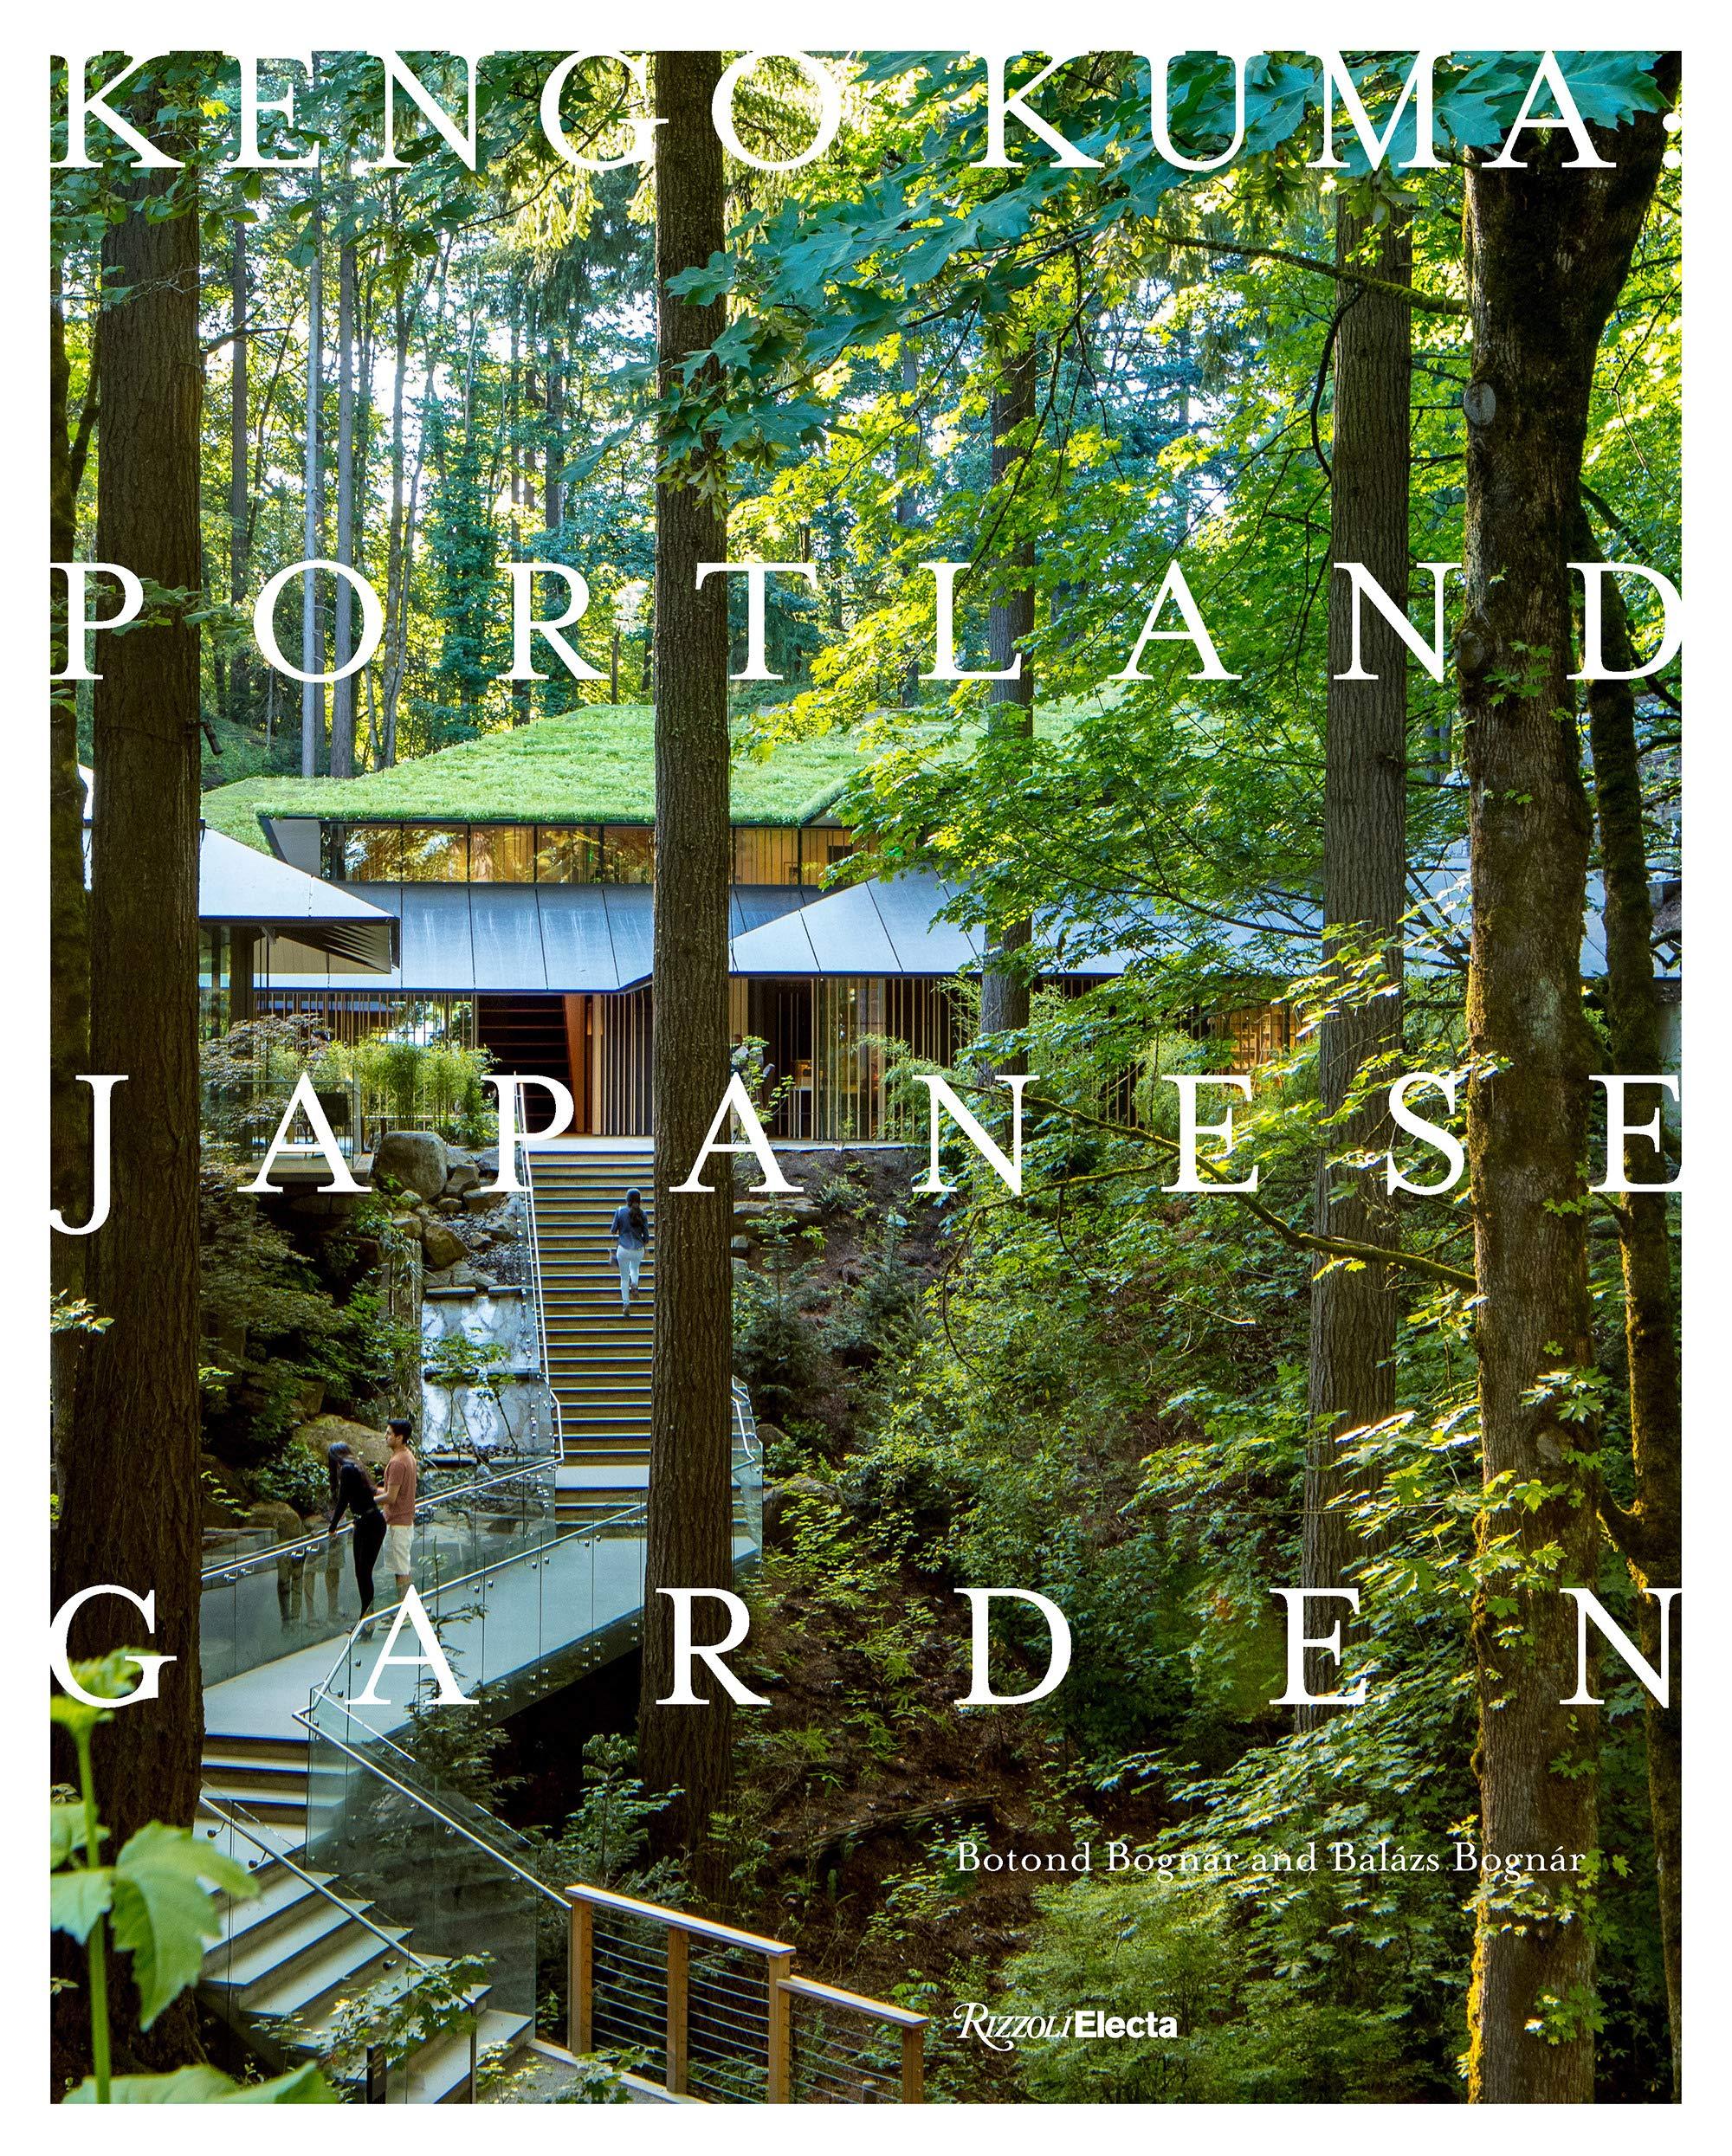 Kengo Kuma Portland Japanese Garden Bognar Botond Bognar